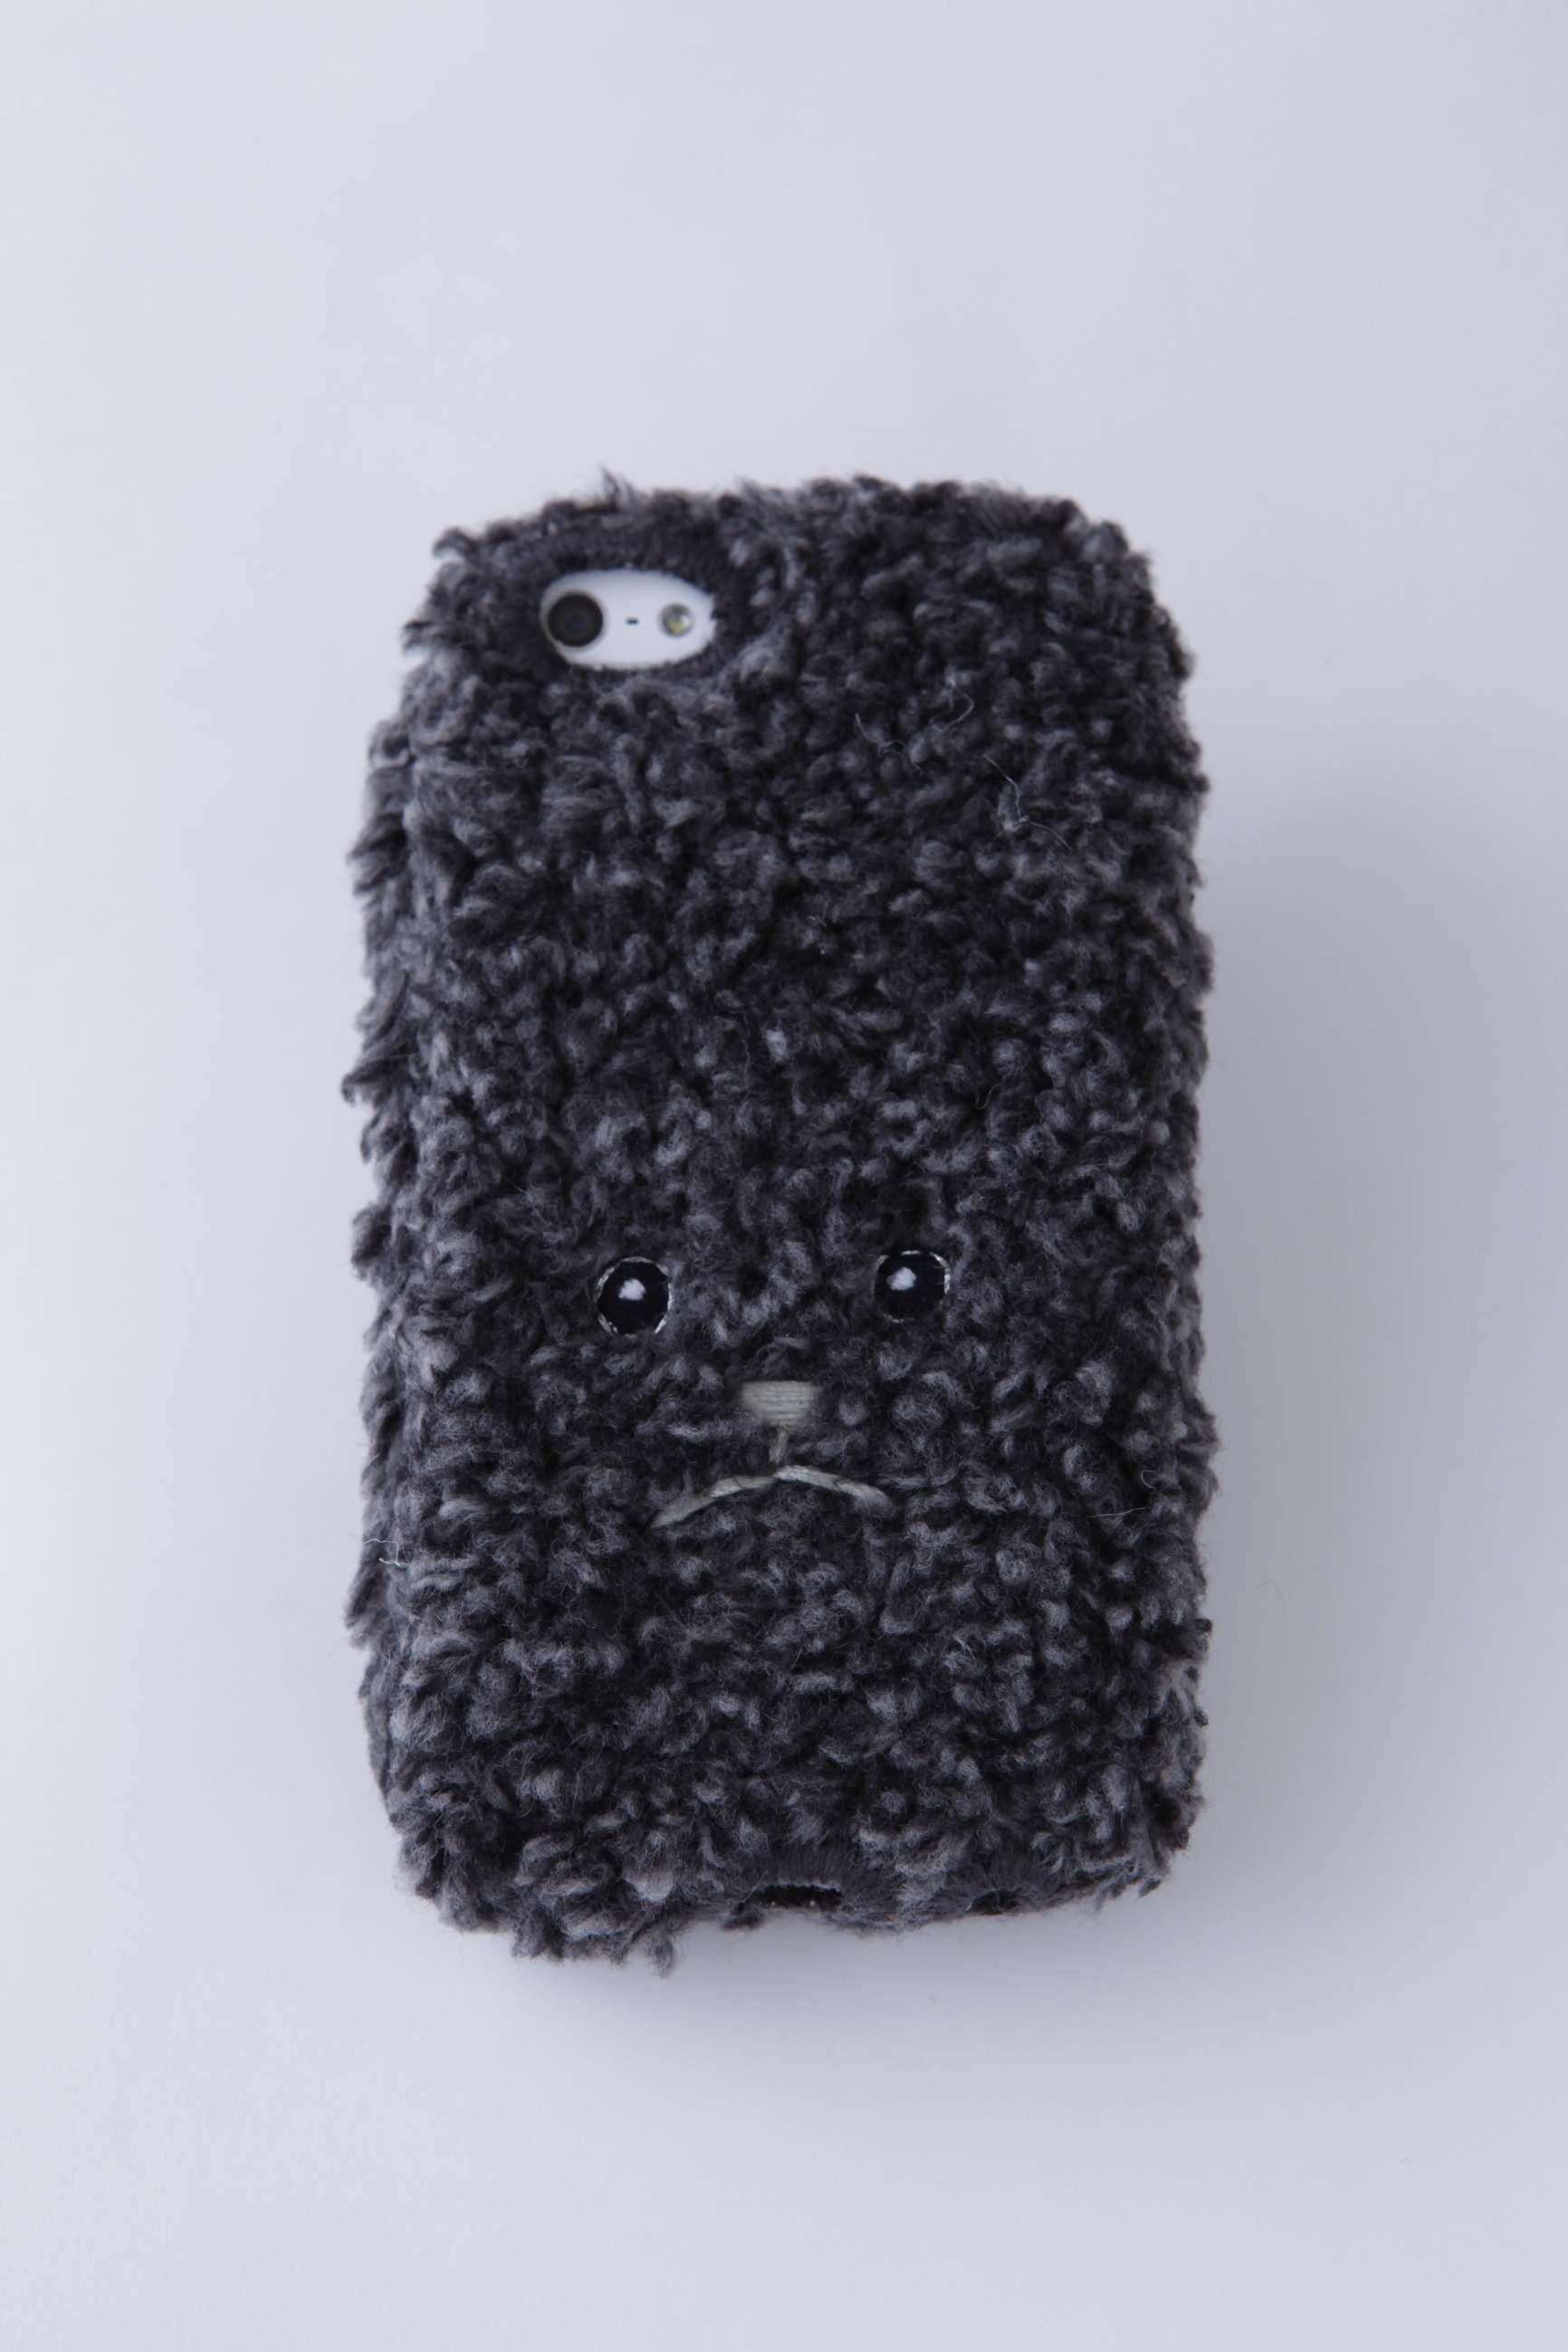 【iPhone6/6S専用】トイプードルiPhone6/6sカバー(mix) 【ブラック】